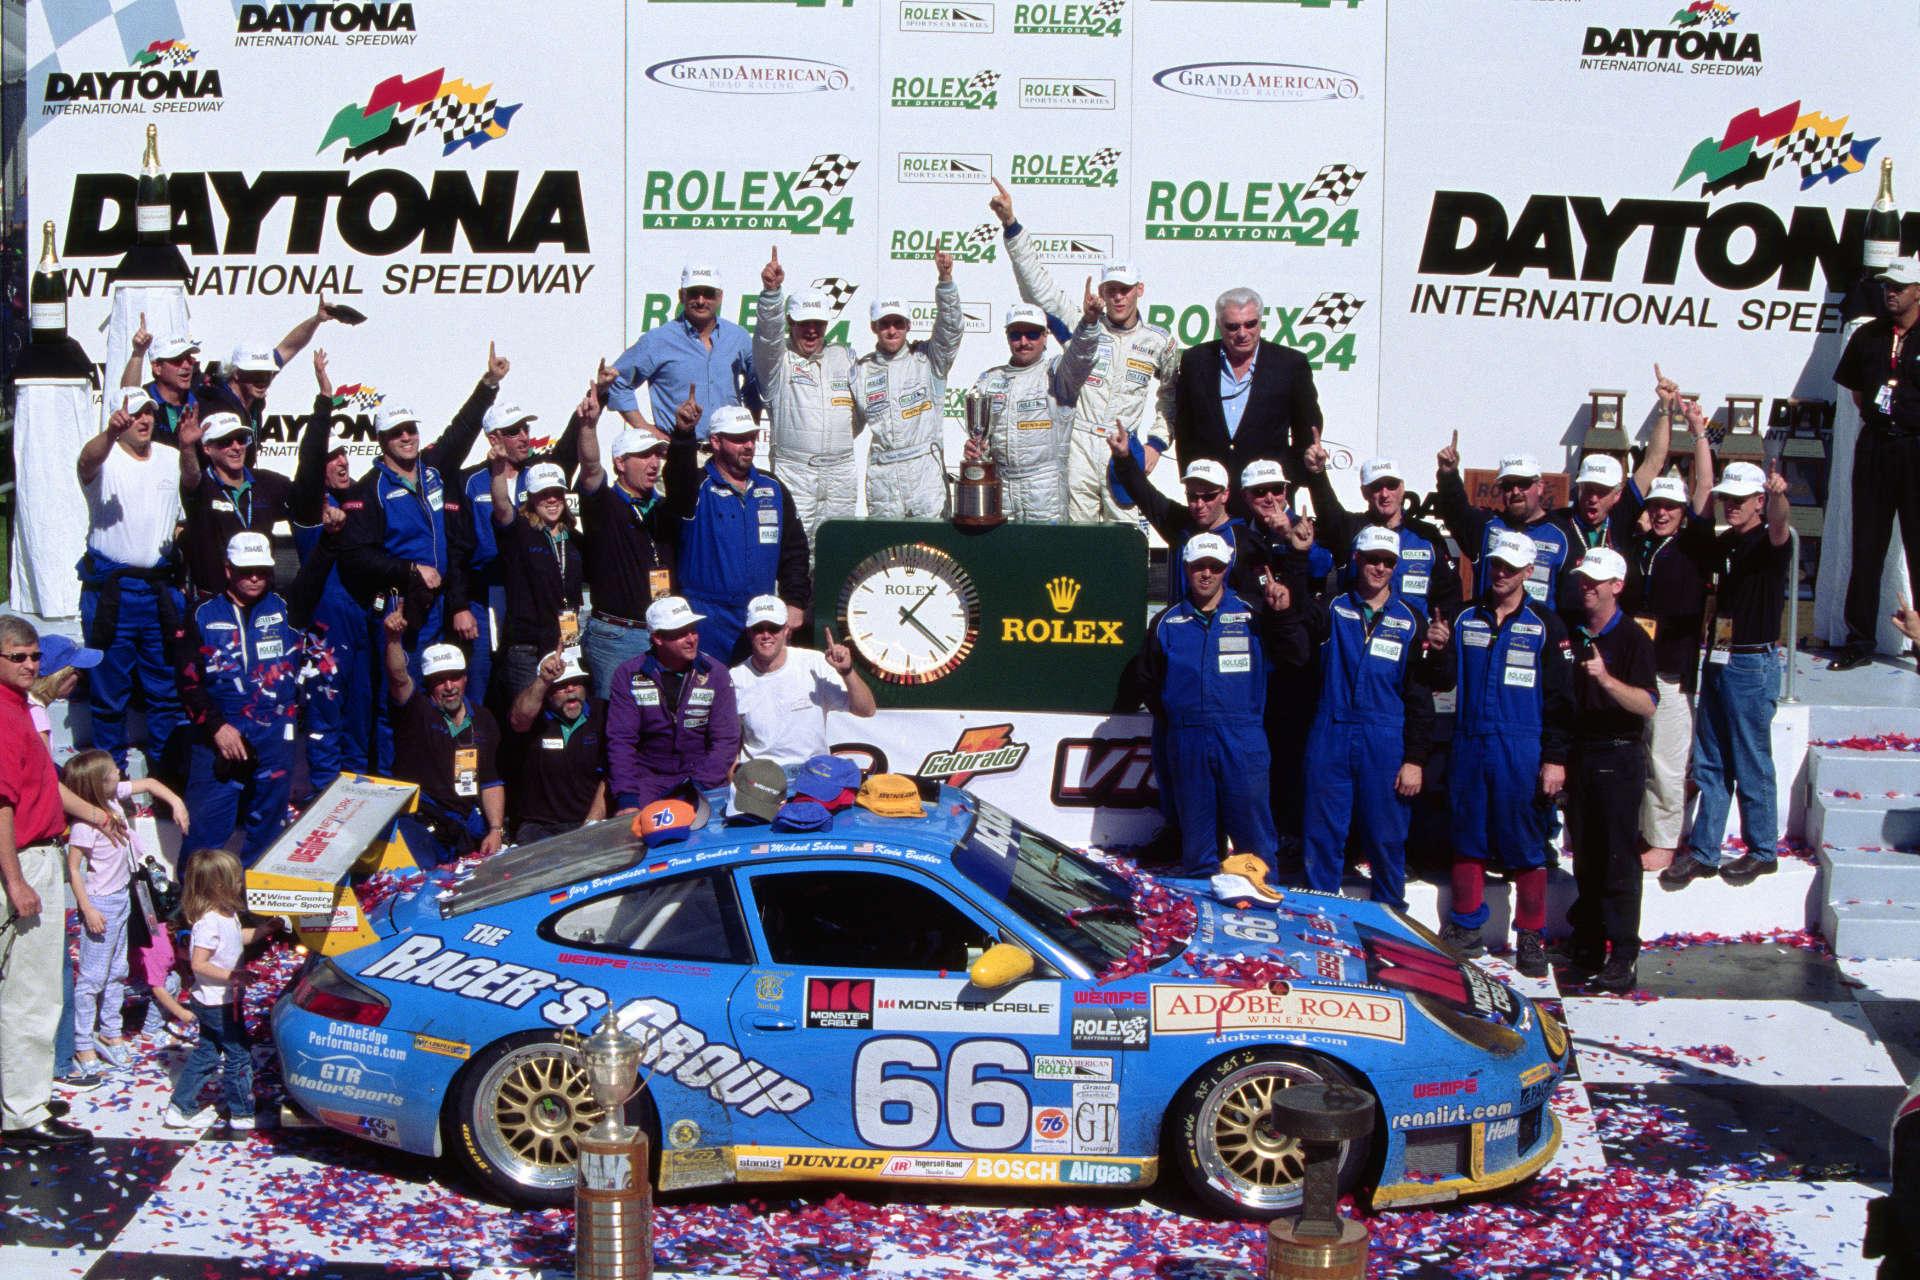 2003 Daytona Porsche